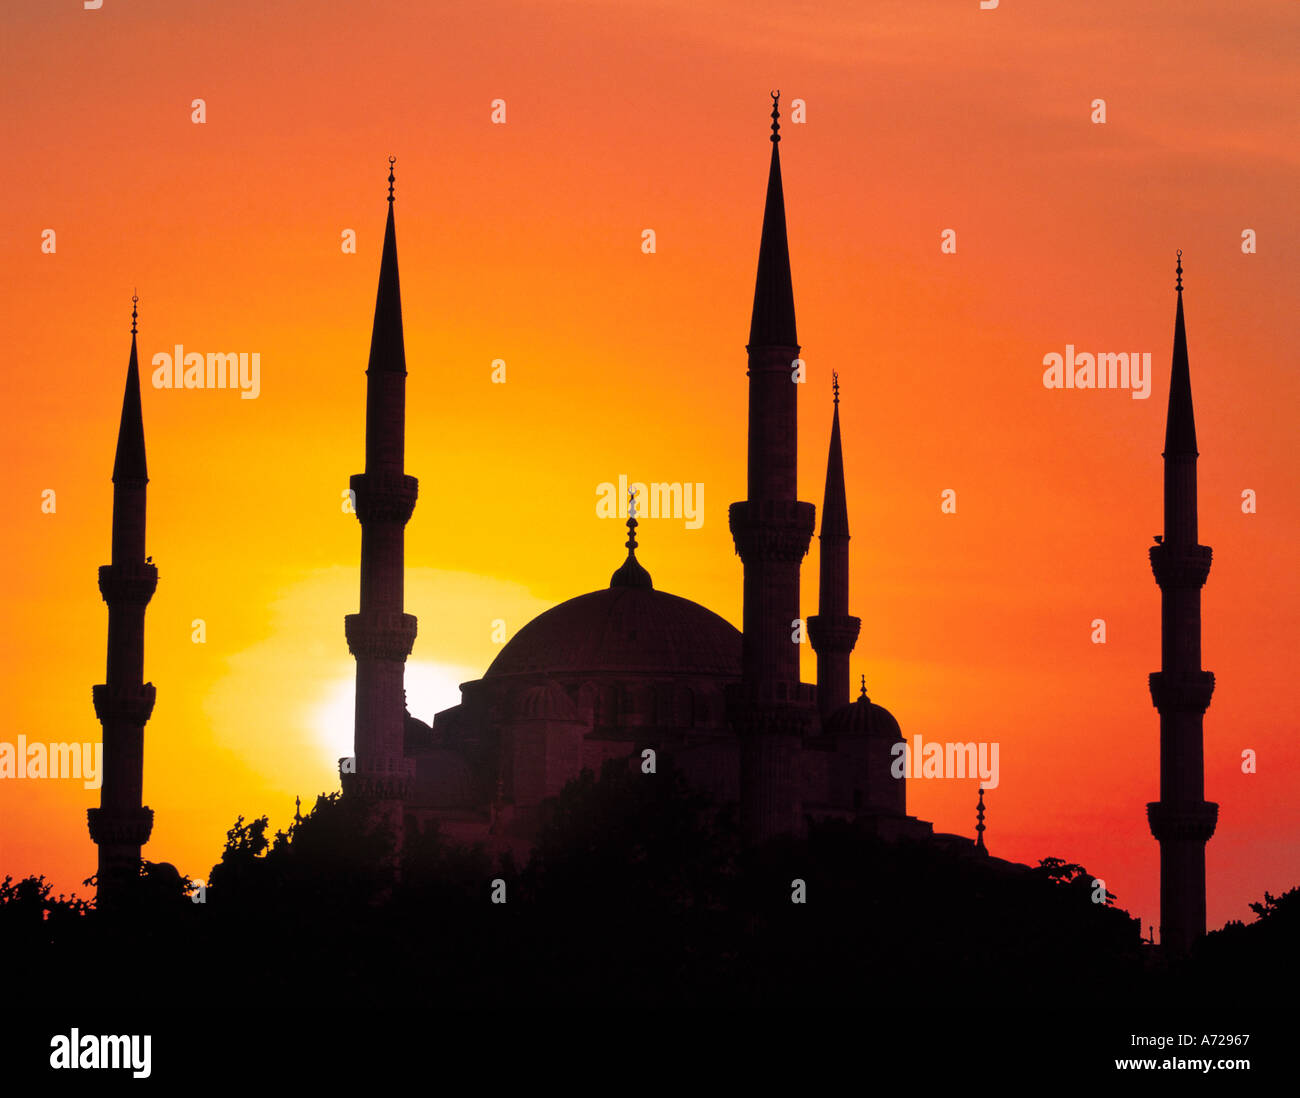 Sultan Ahmet Camii la moschea Moschea Blu di Istanbul in Turchia Immagini Stock